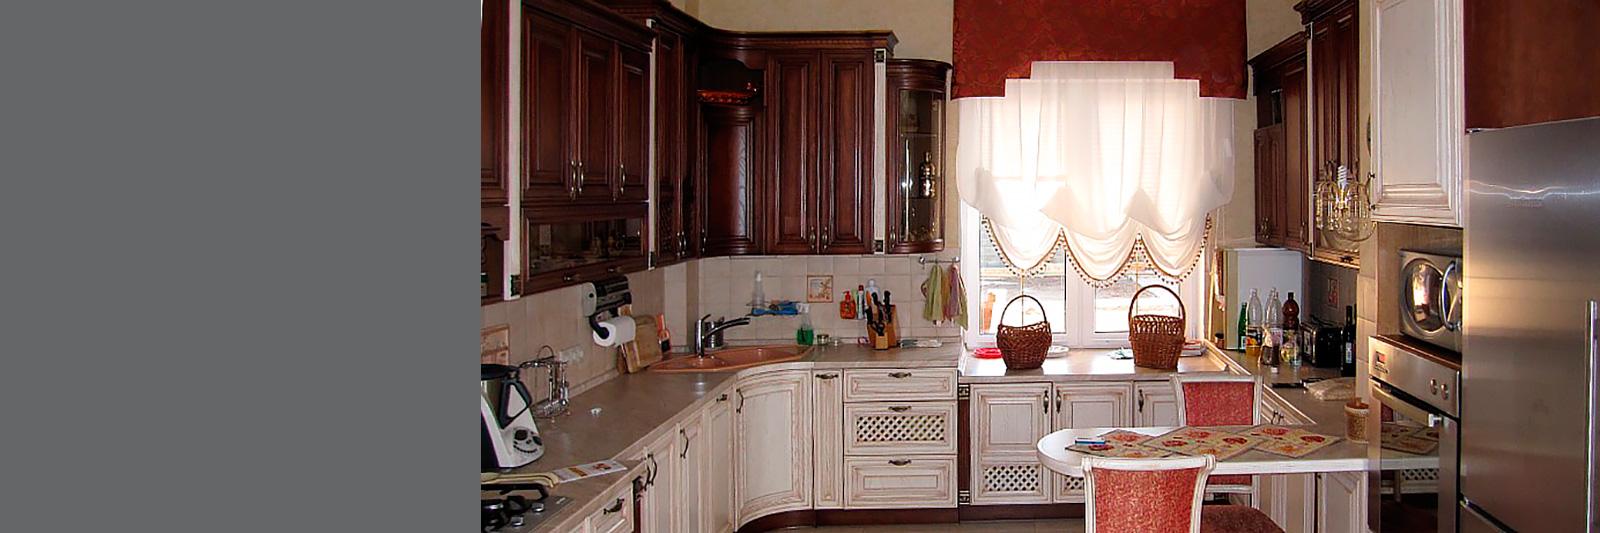 Угловая кухня с фасадами из массива на заказ